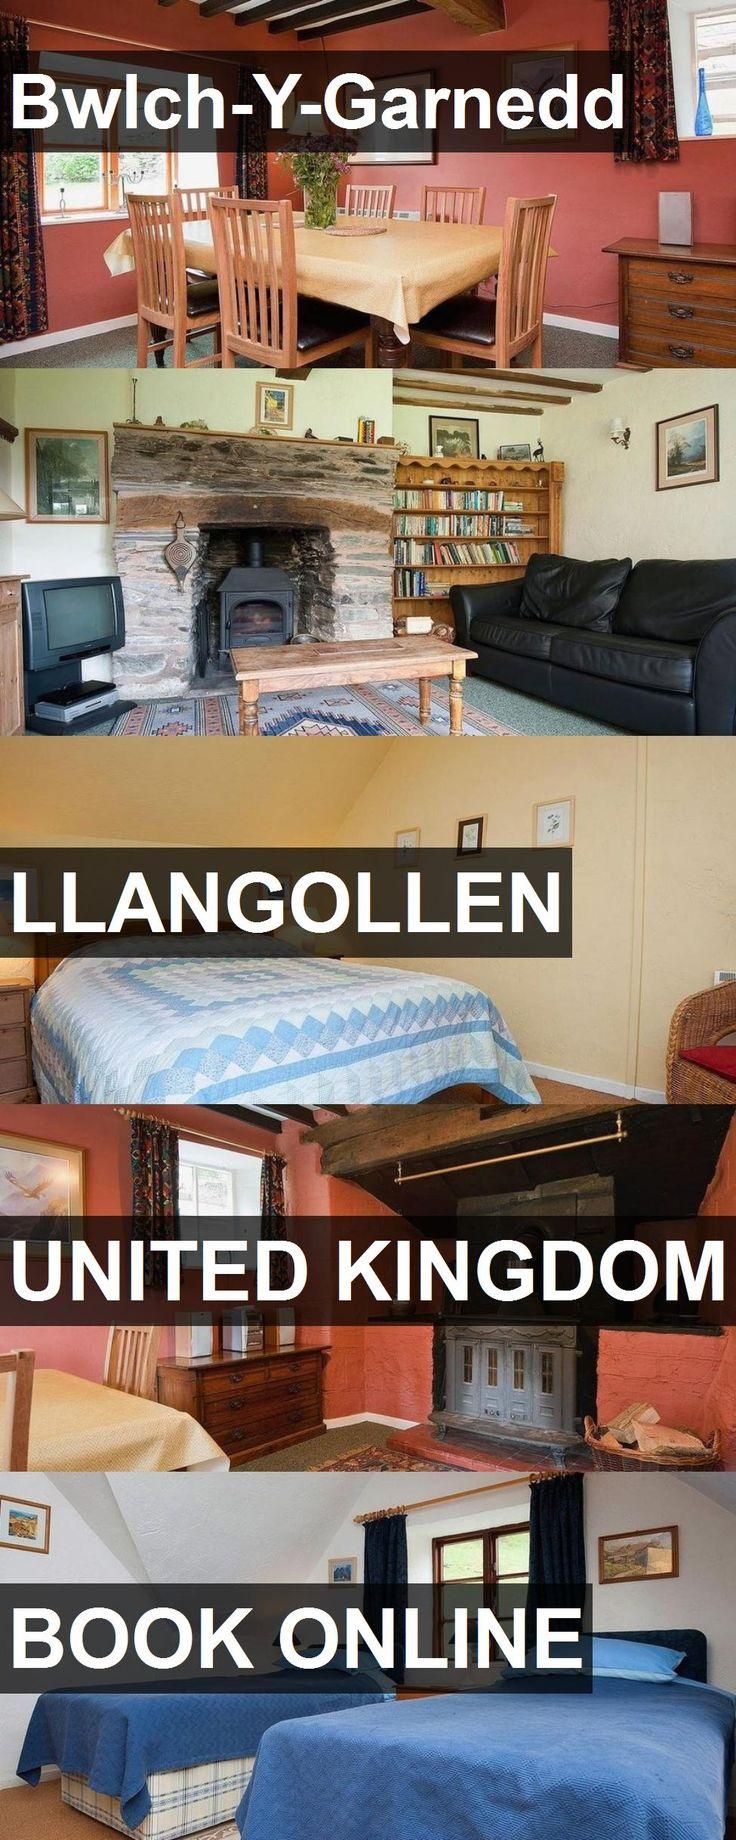 Hotel Bwlch-Y-Garnedd in Llangollen, United Kingdom. For more information, photos, reviews and best prices please follow the link. #UnitedKingdom #Llangollen #travel #vacation #hotel